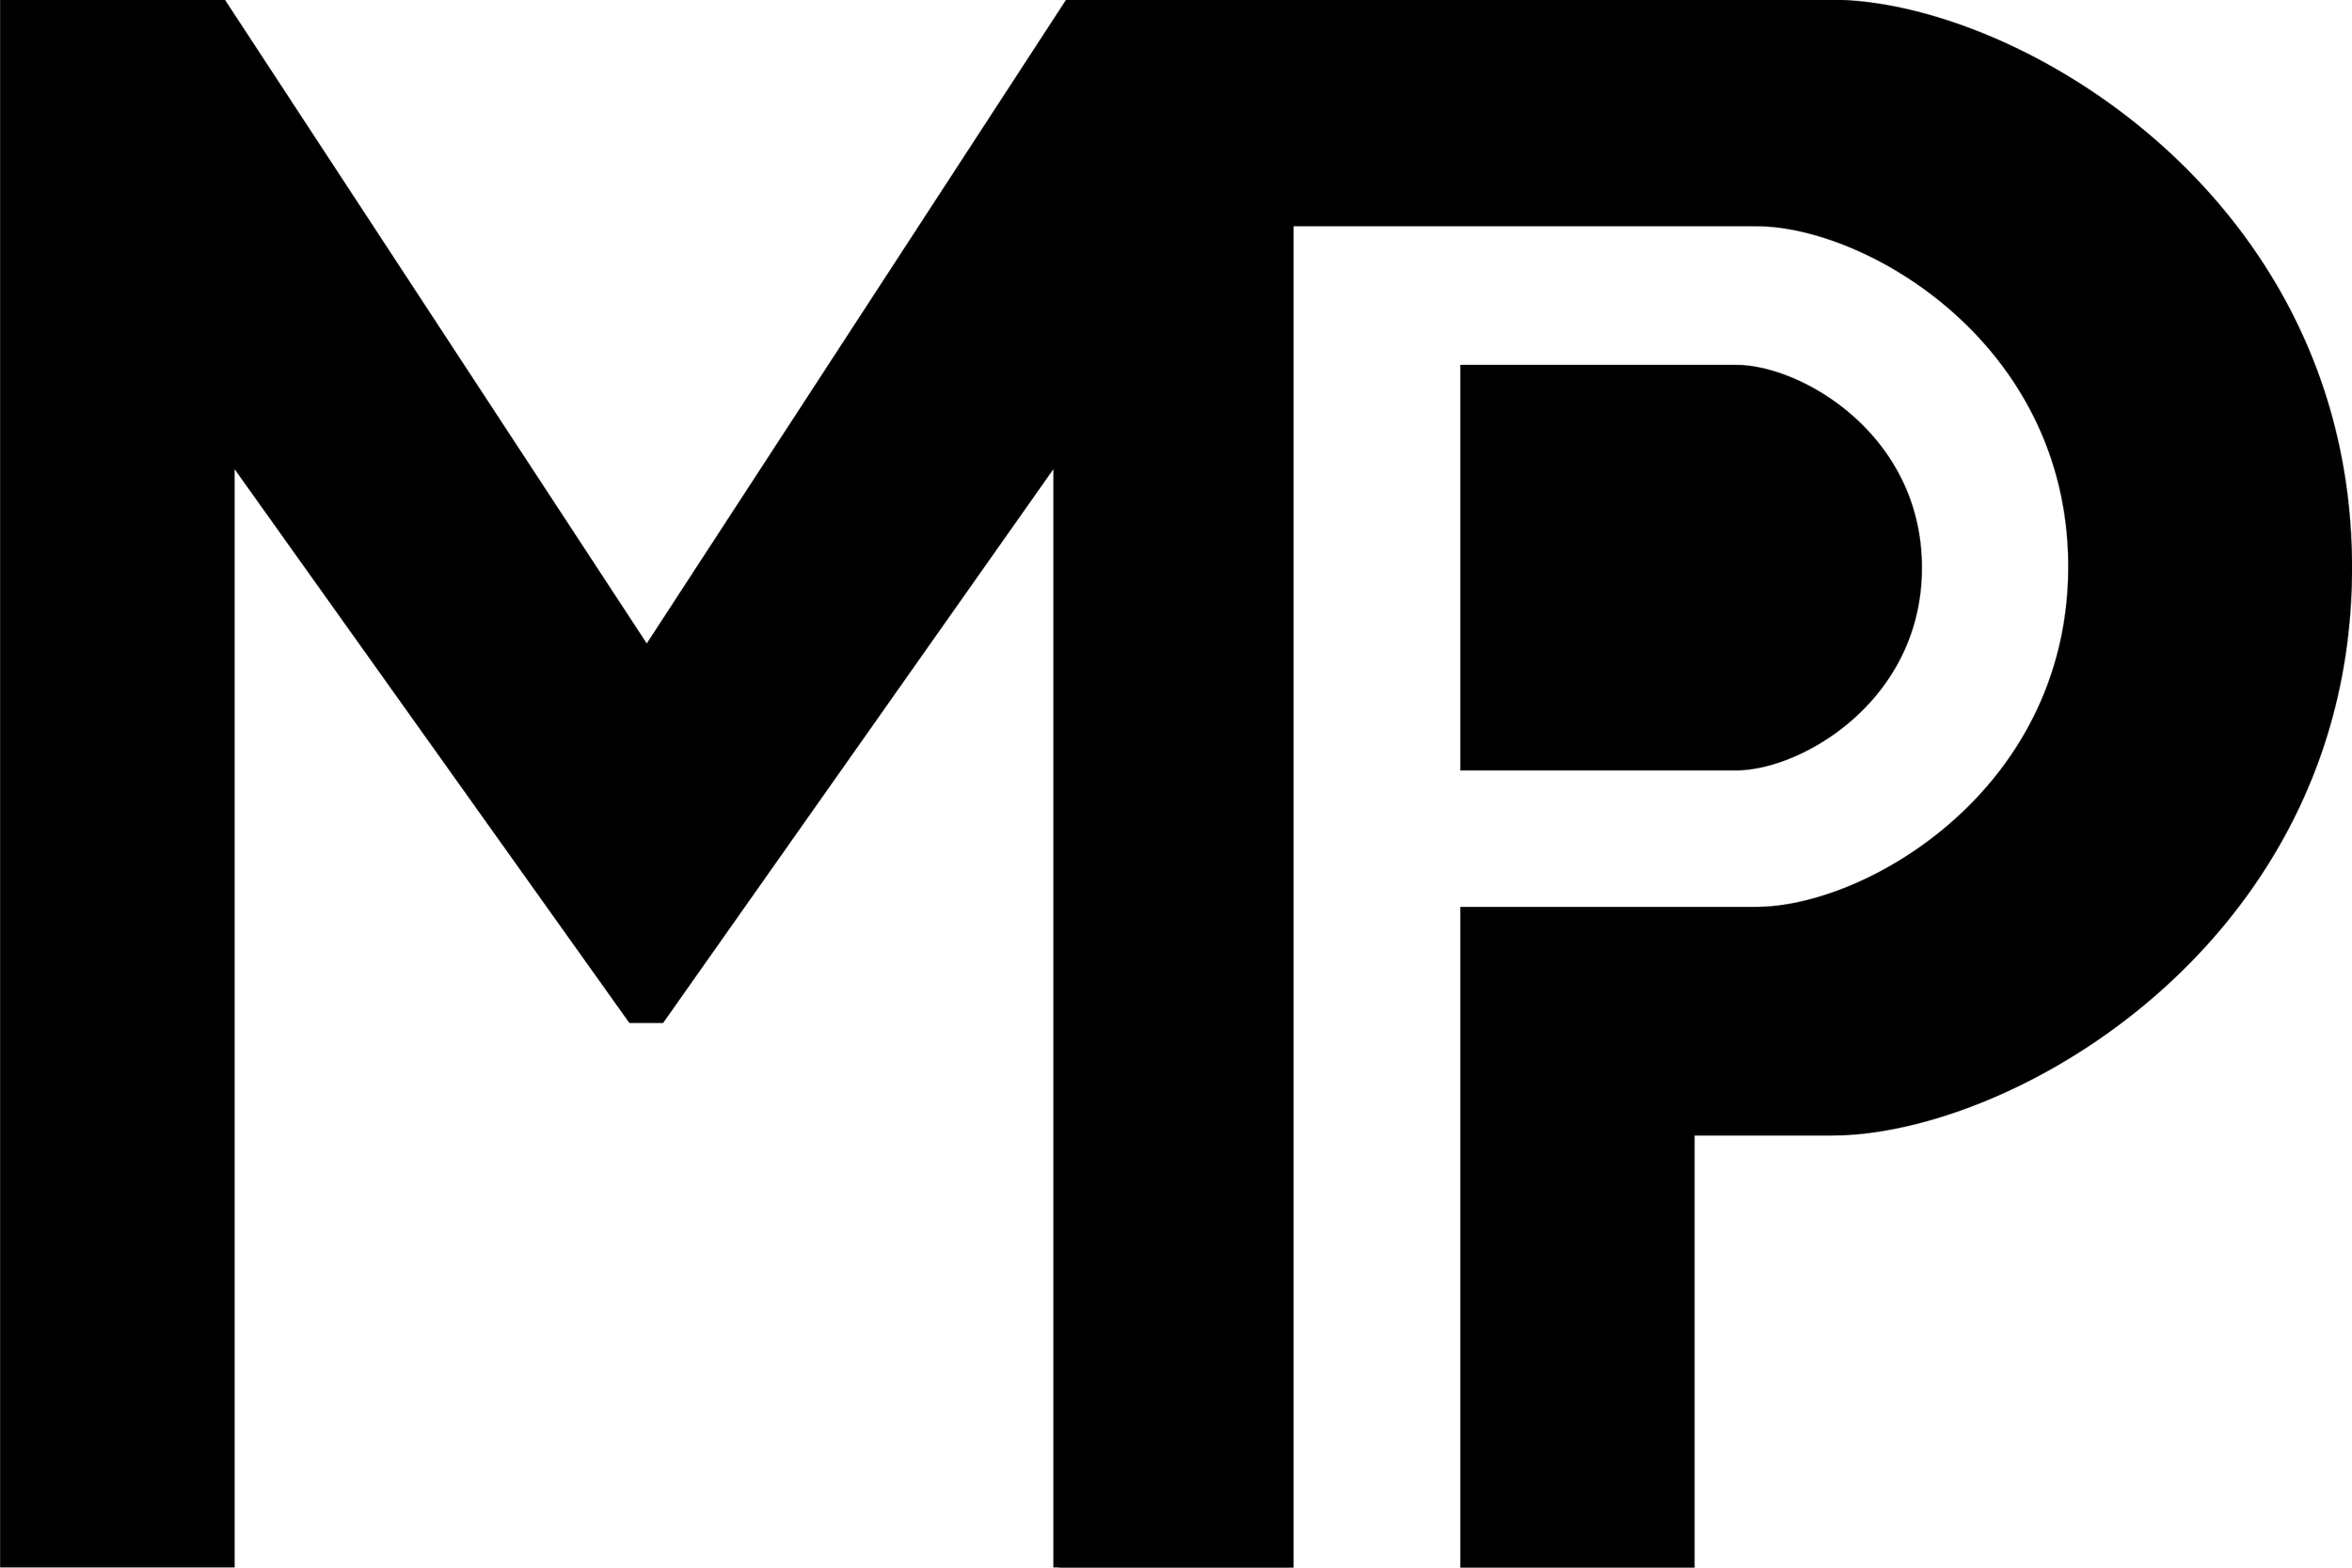 Megapixy (logo)